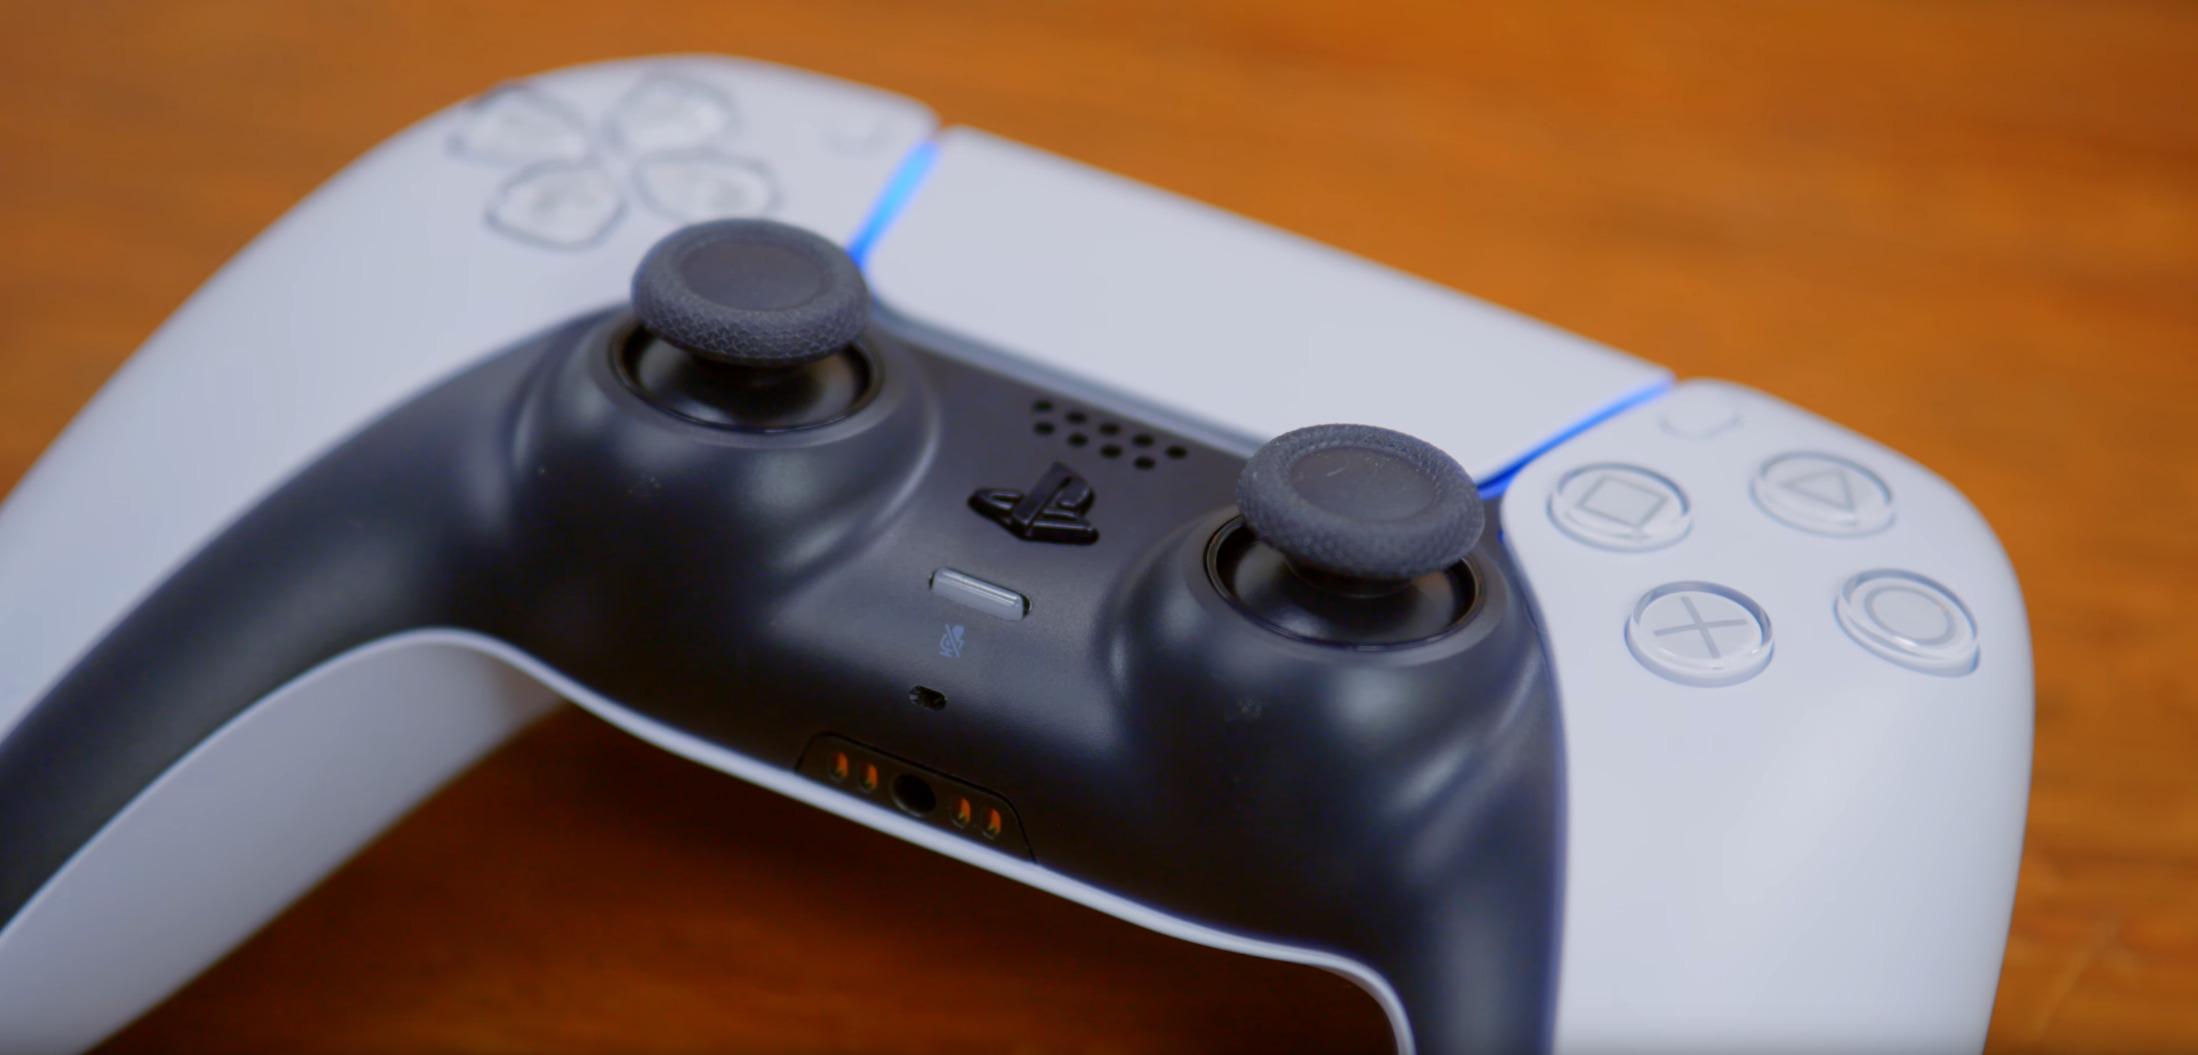 PS5手柄开箱视频放出 兼容PC和安卓设备